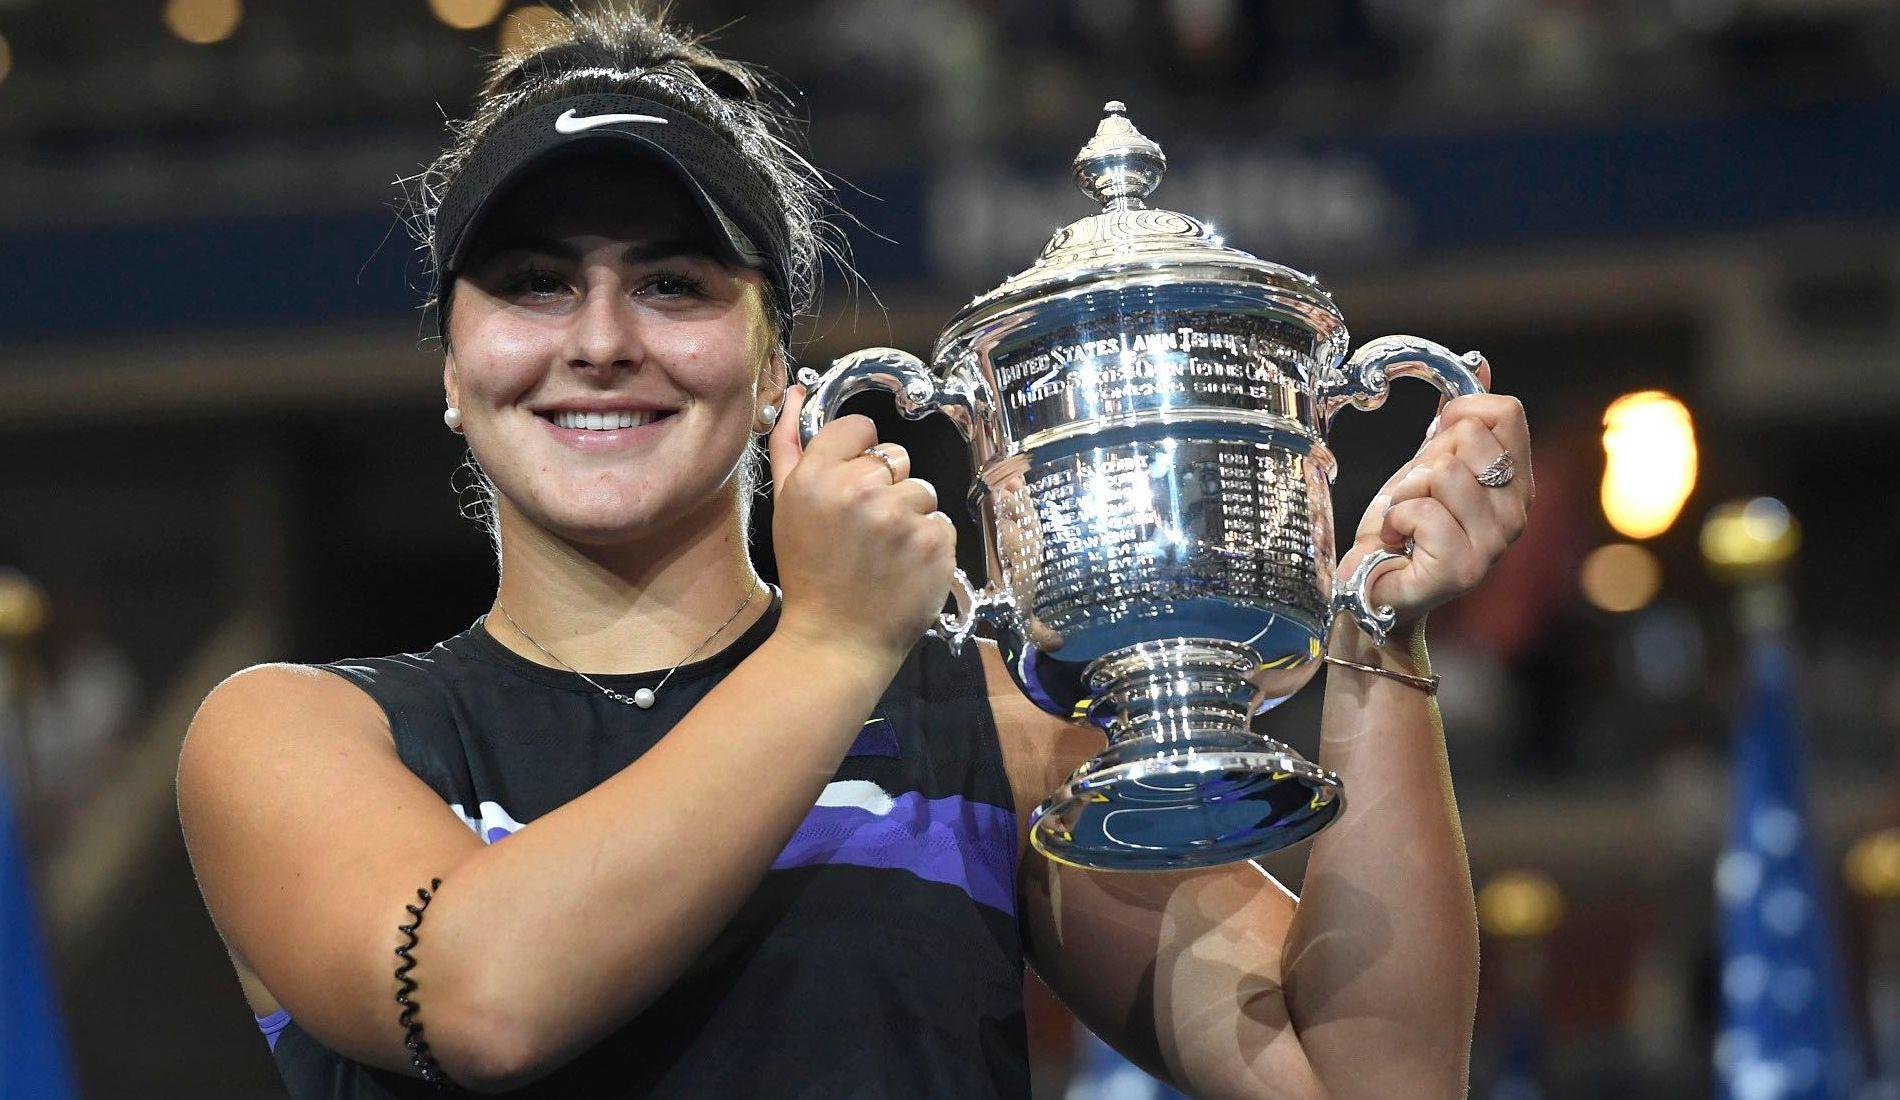 Bianca Andreescu winning 2019 US Open